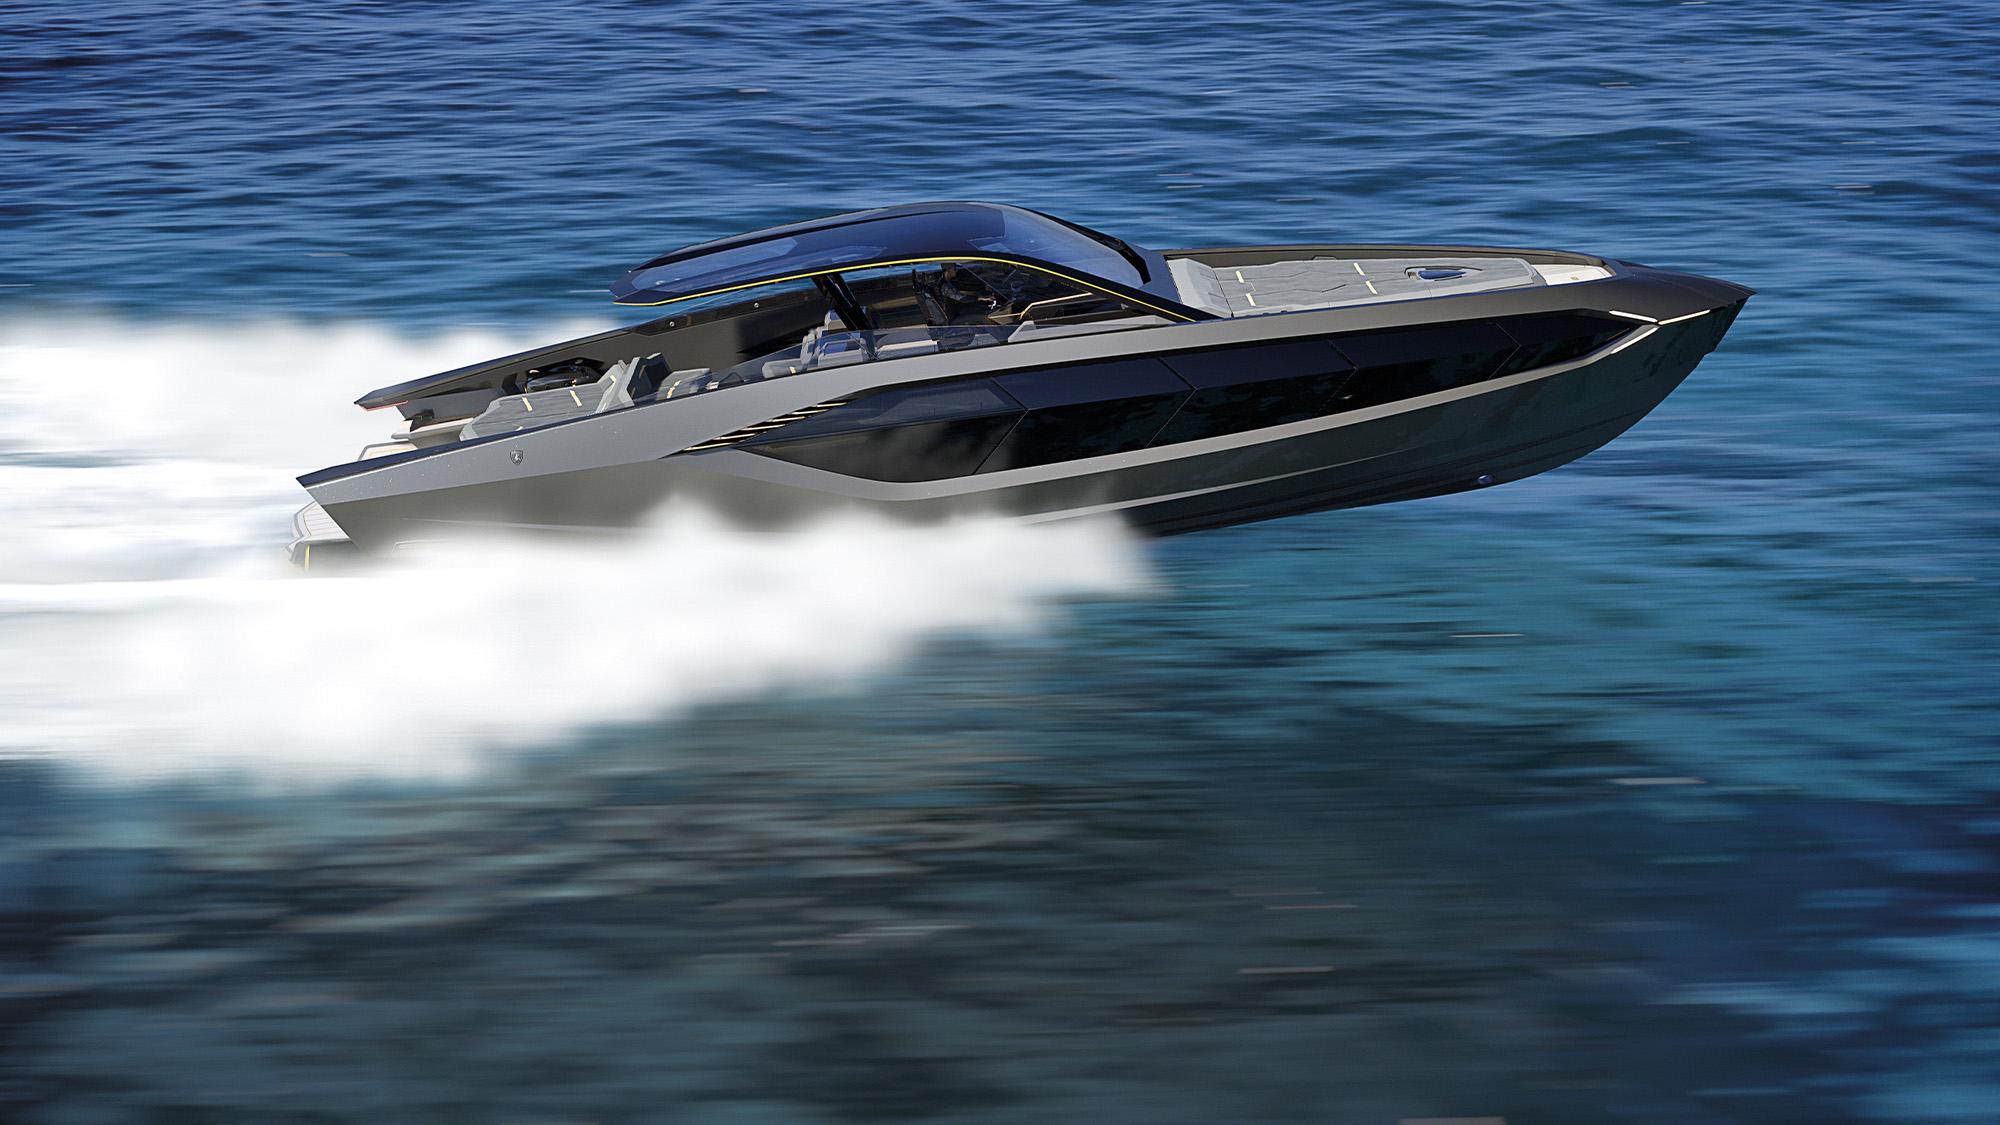 Lamborghini powerboat